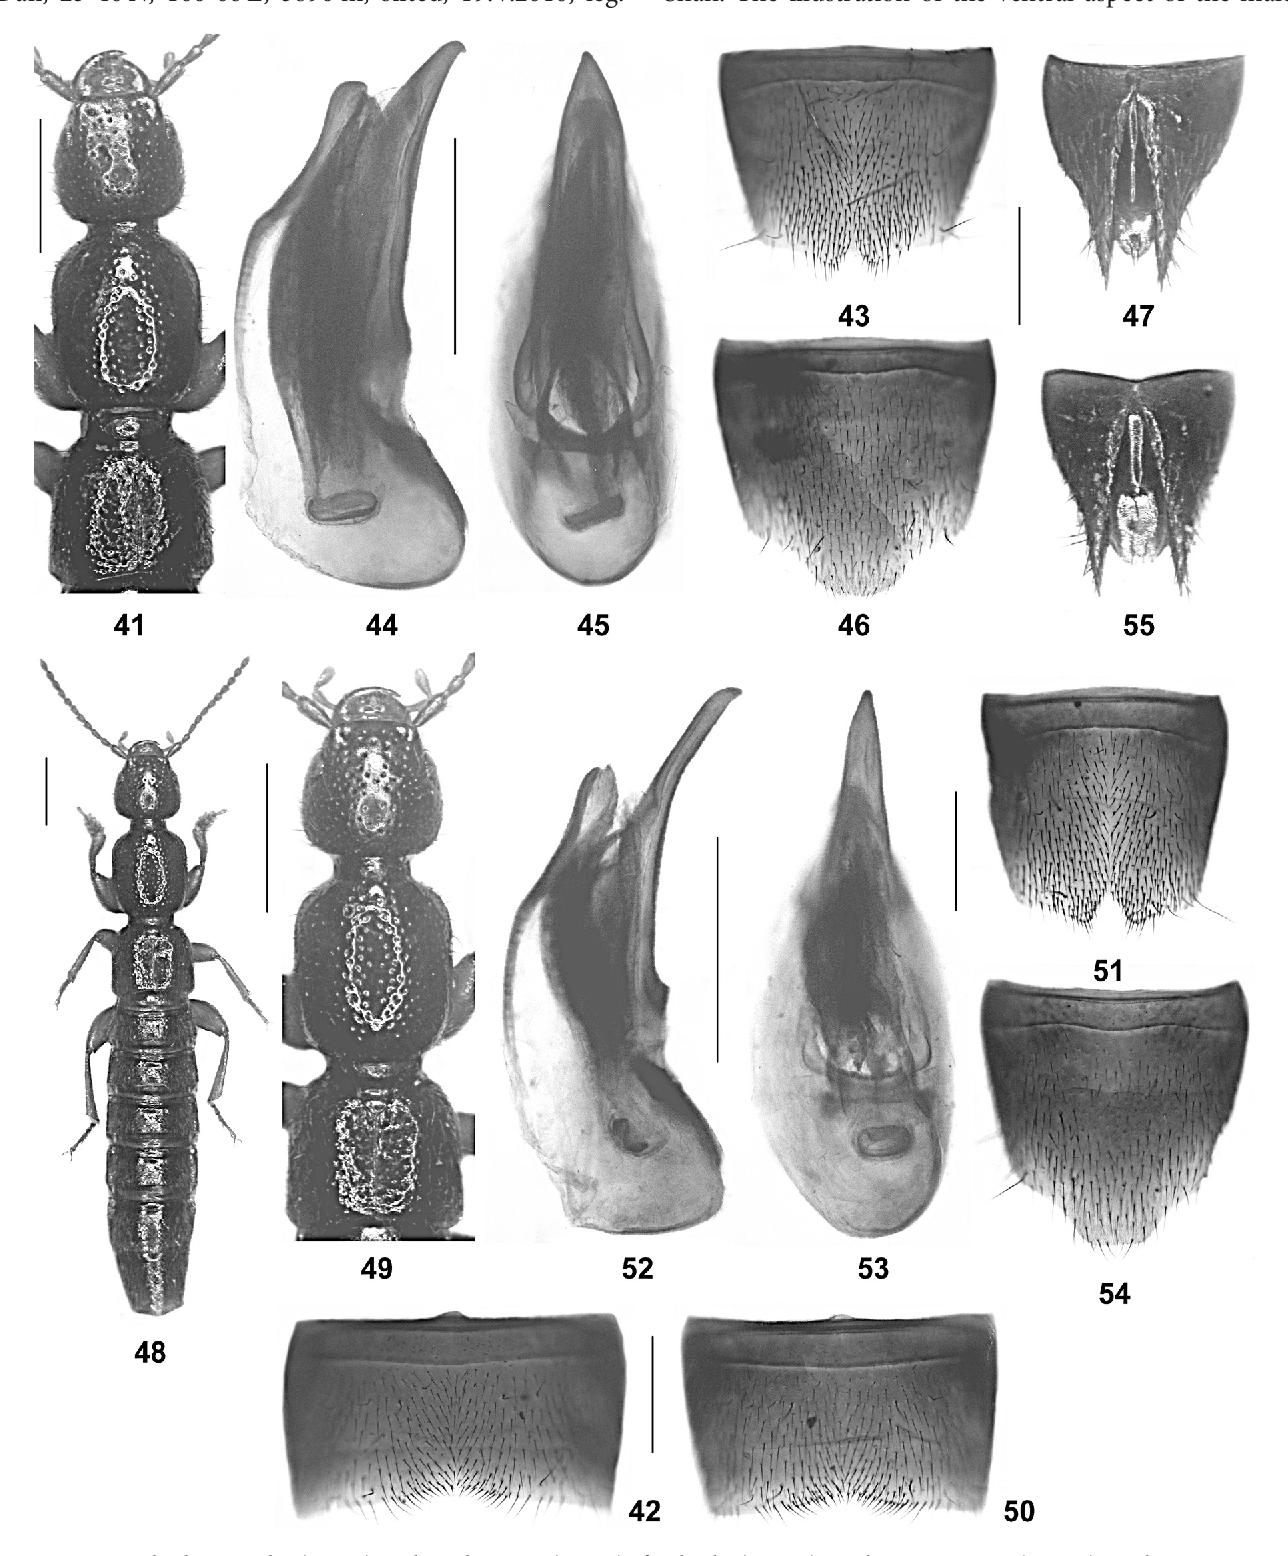 figure 41-55